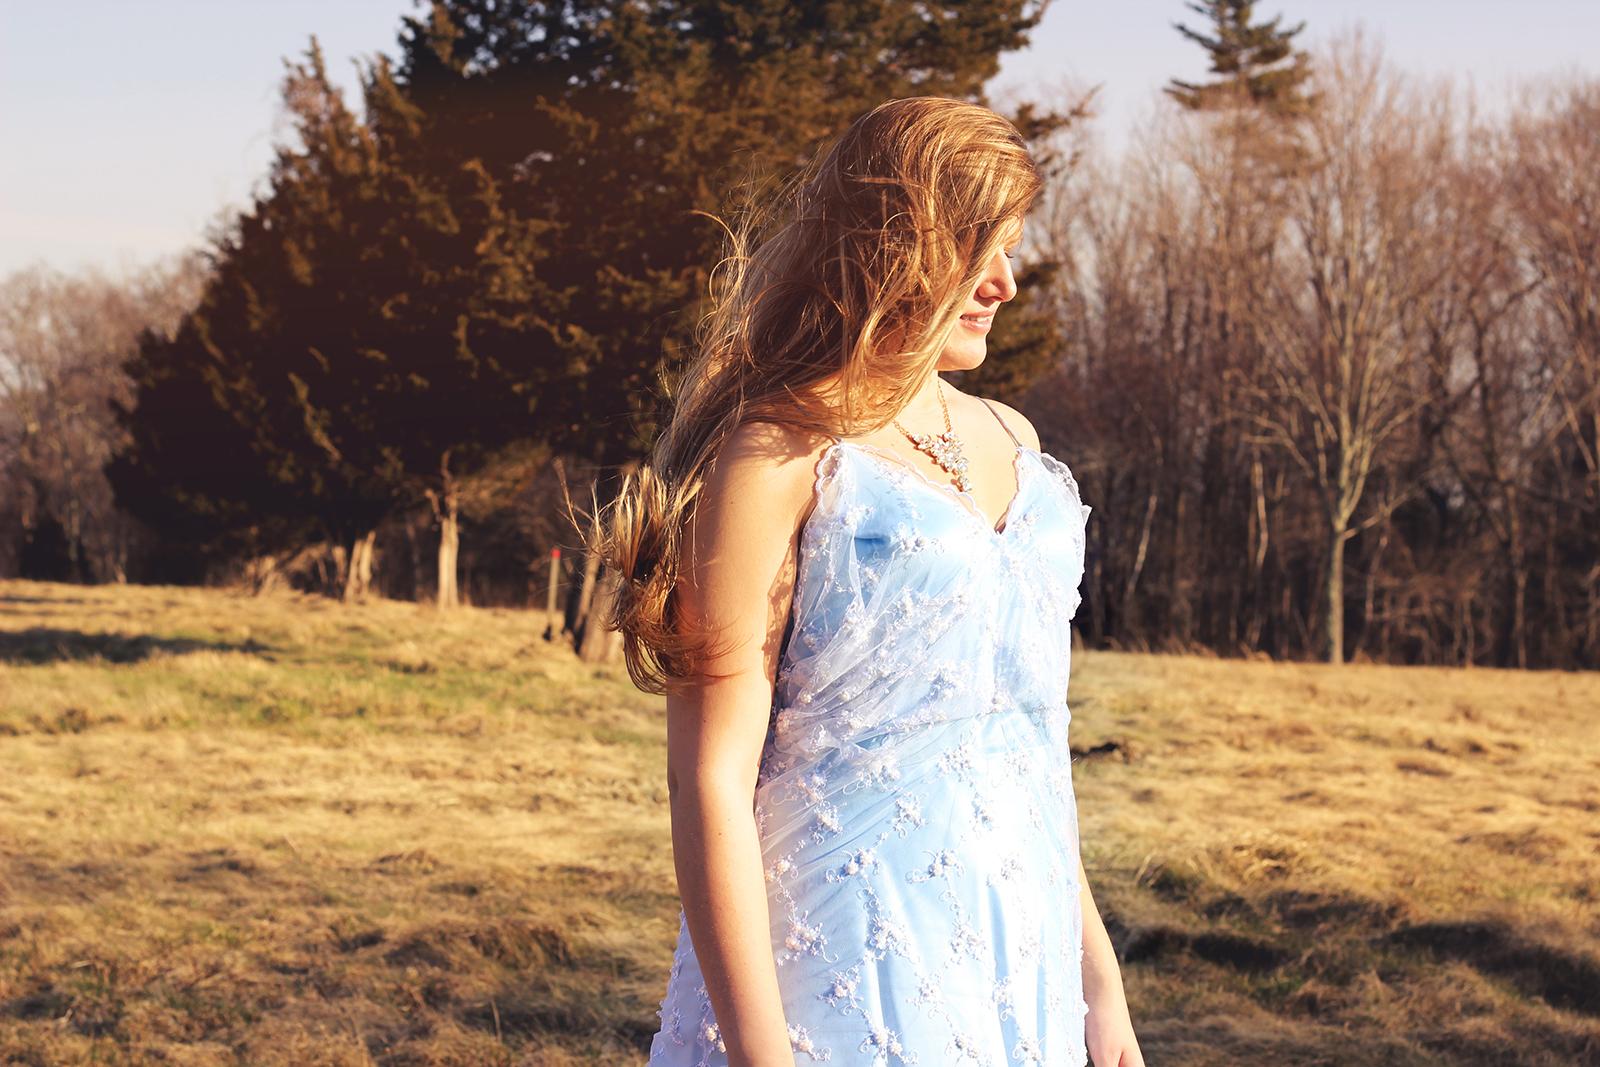 blueweddingdress_sky_hair_small.jpg